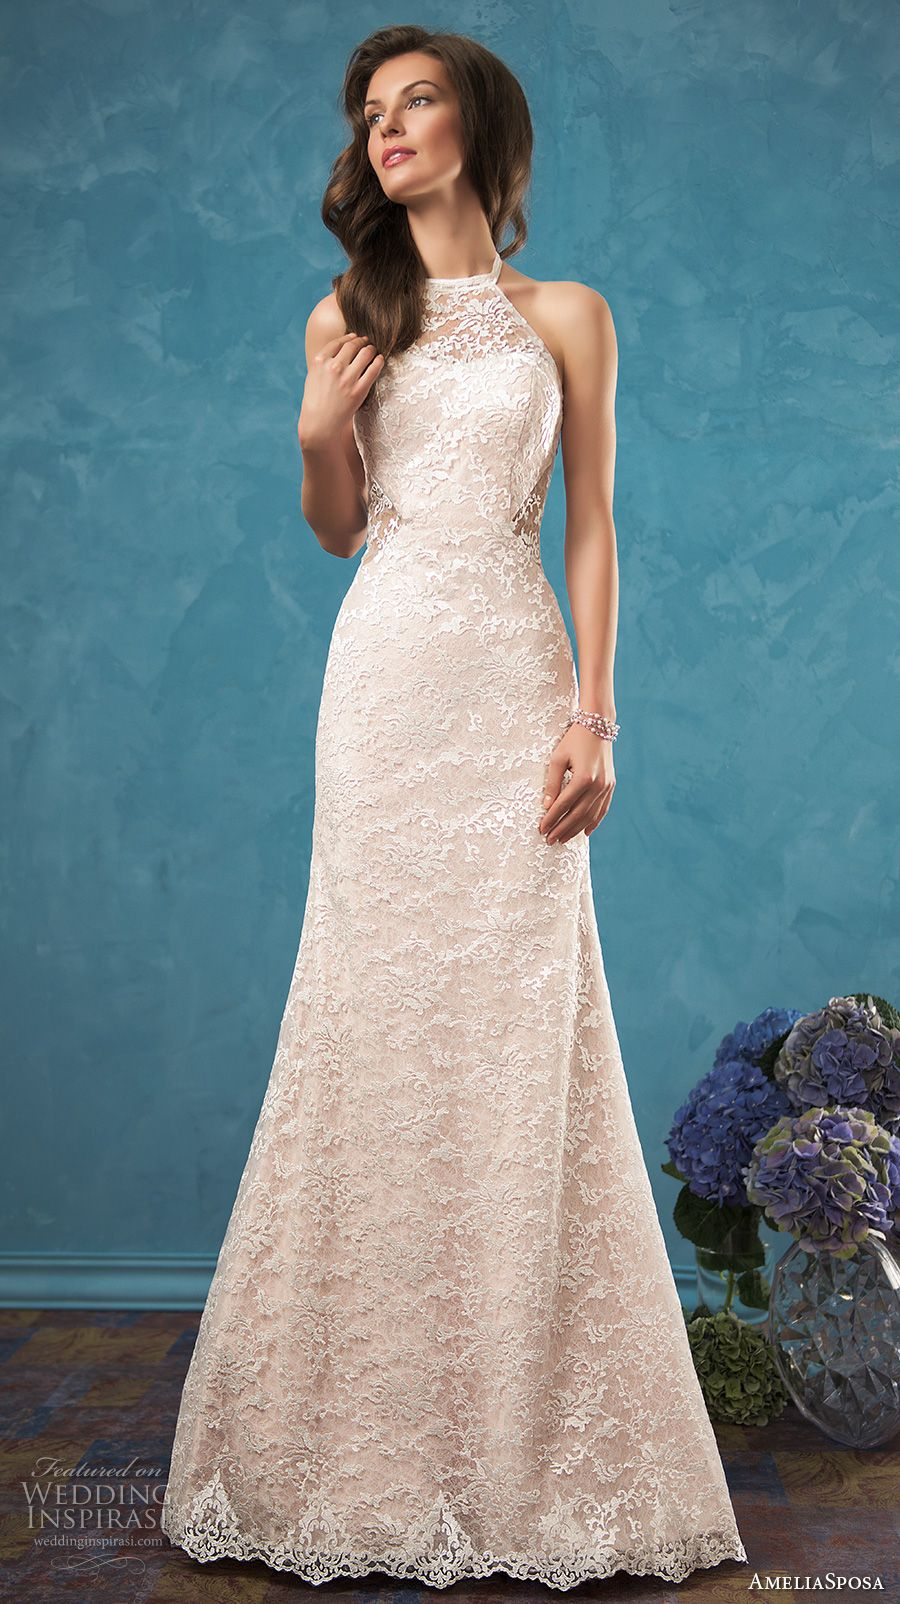 Amelia Sposa 2017 Wedding Dresses | Amelia sposa, Color wedding ...